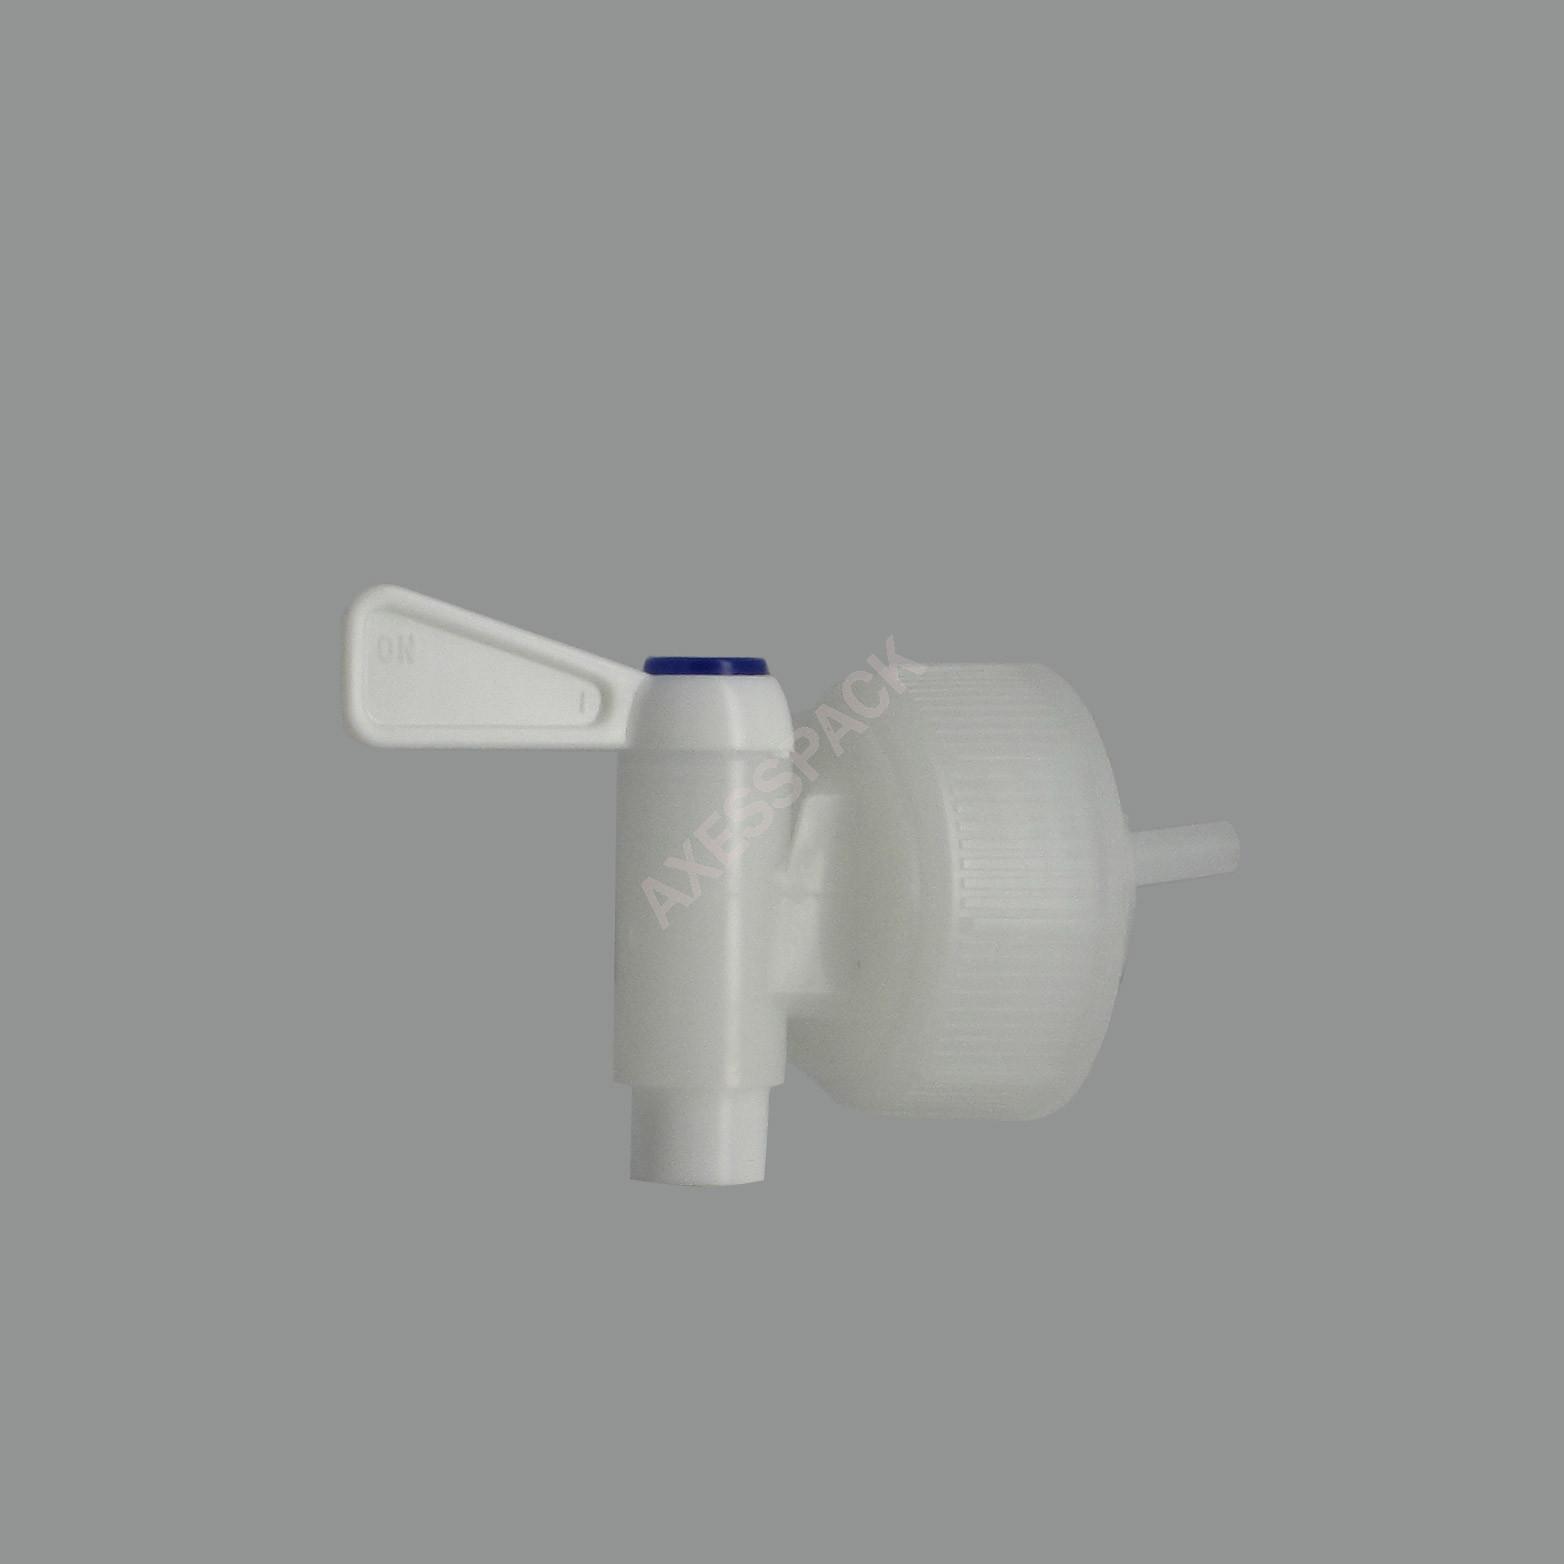 Robinet Smooth-Flow sur Capsule DIN45 AFT